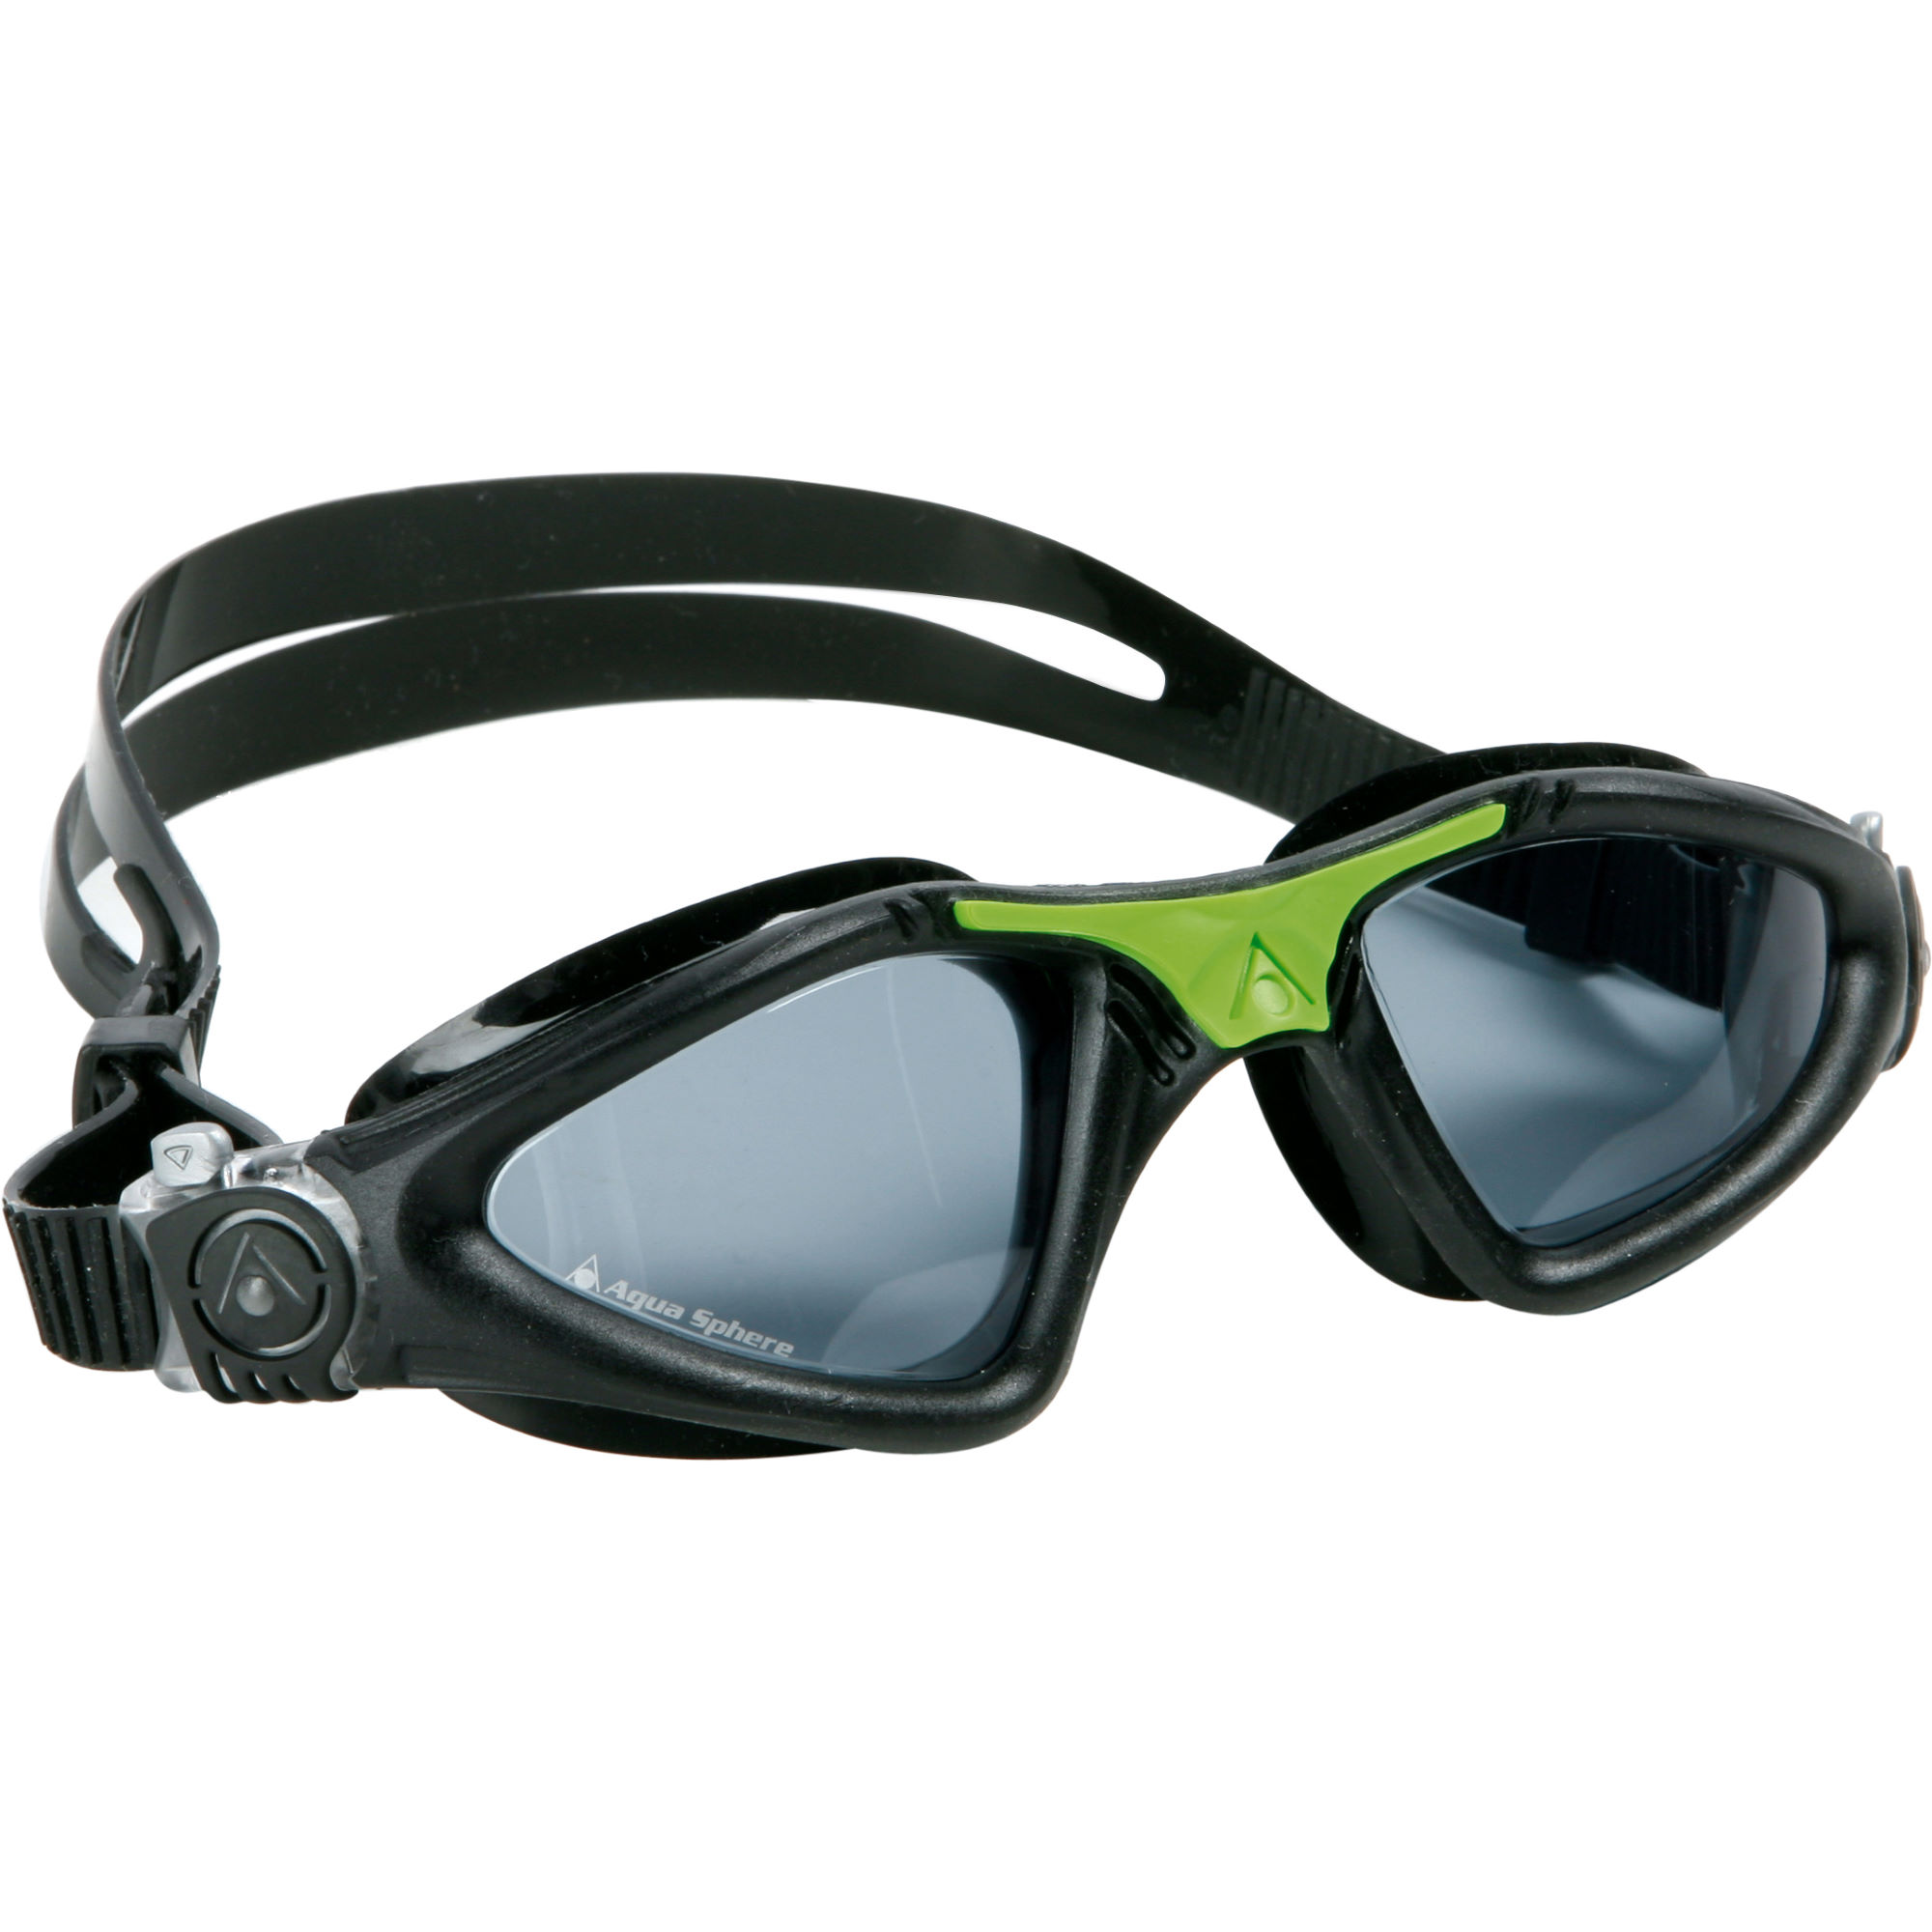 Aqua Sphere Kayenne 游泳休息染色镜片防紫外线防雾游泳泳镜热销0件包邮